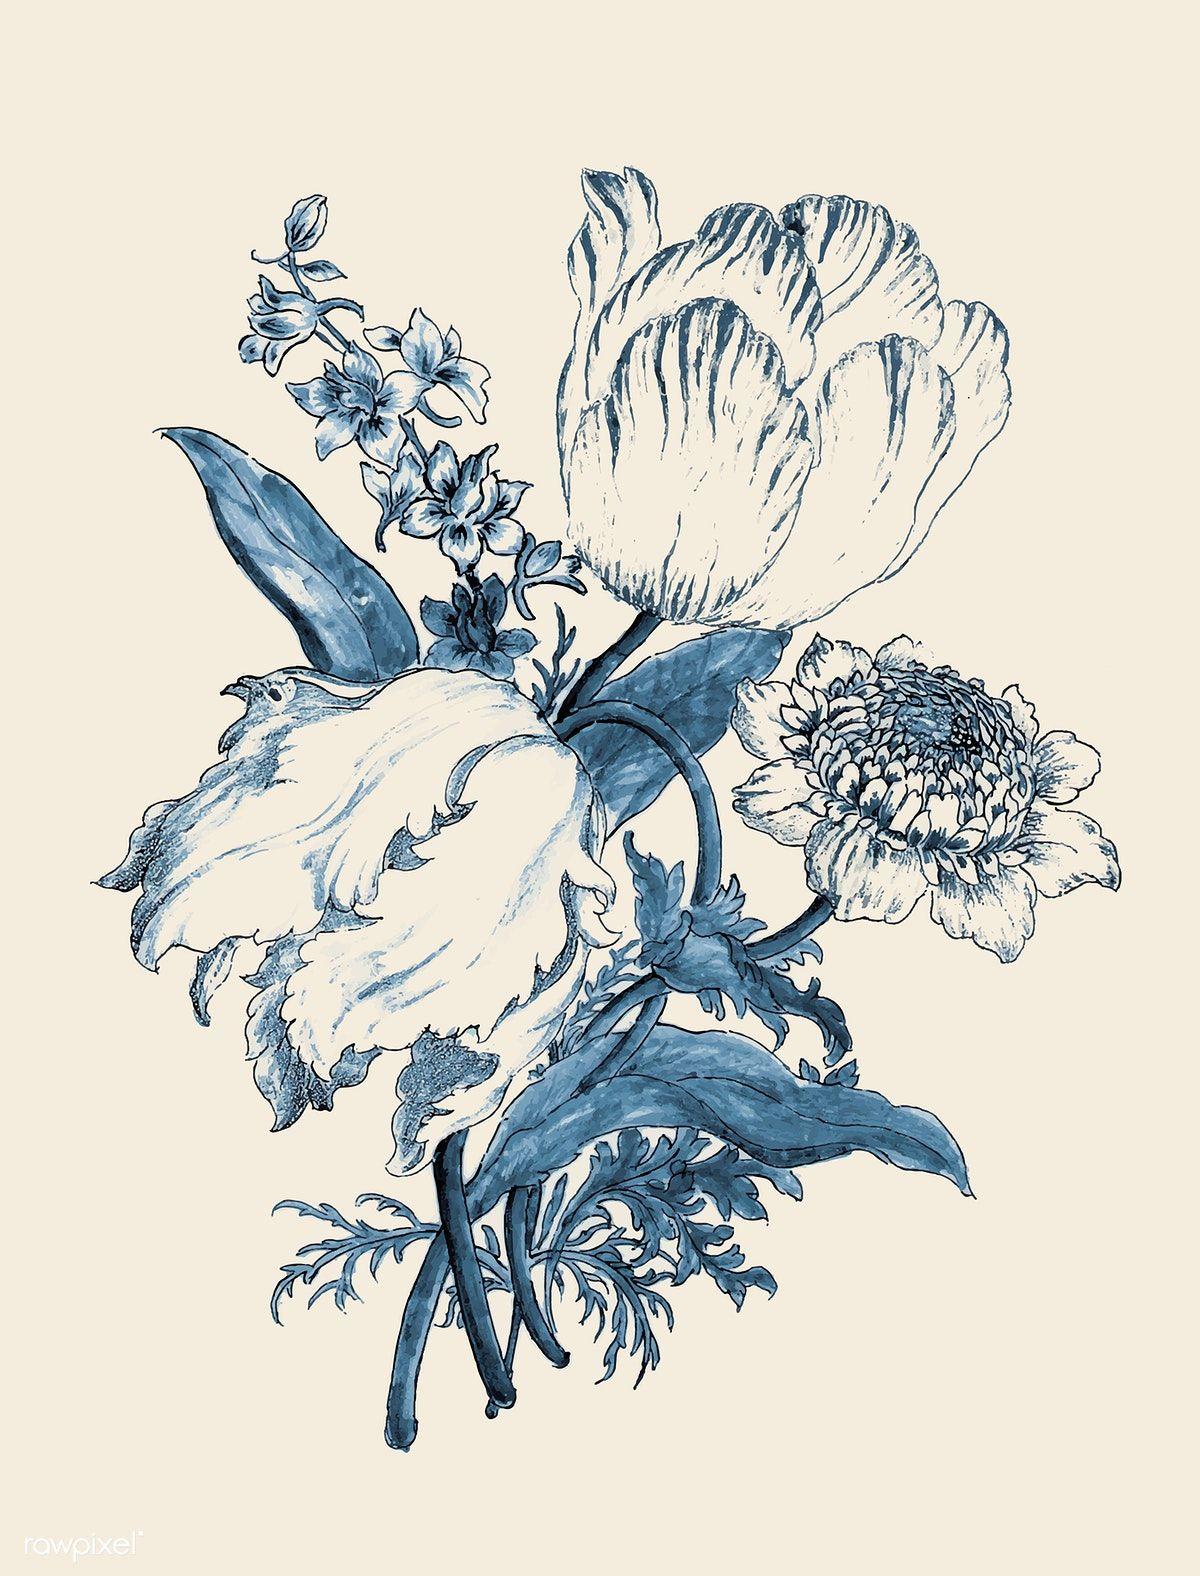 Download Premium Vector Of Vintage Flower Vector Remix From Original In 2020 Flower Illustration Flower Artwork Illustration Wall Art